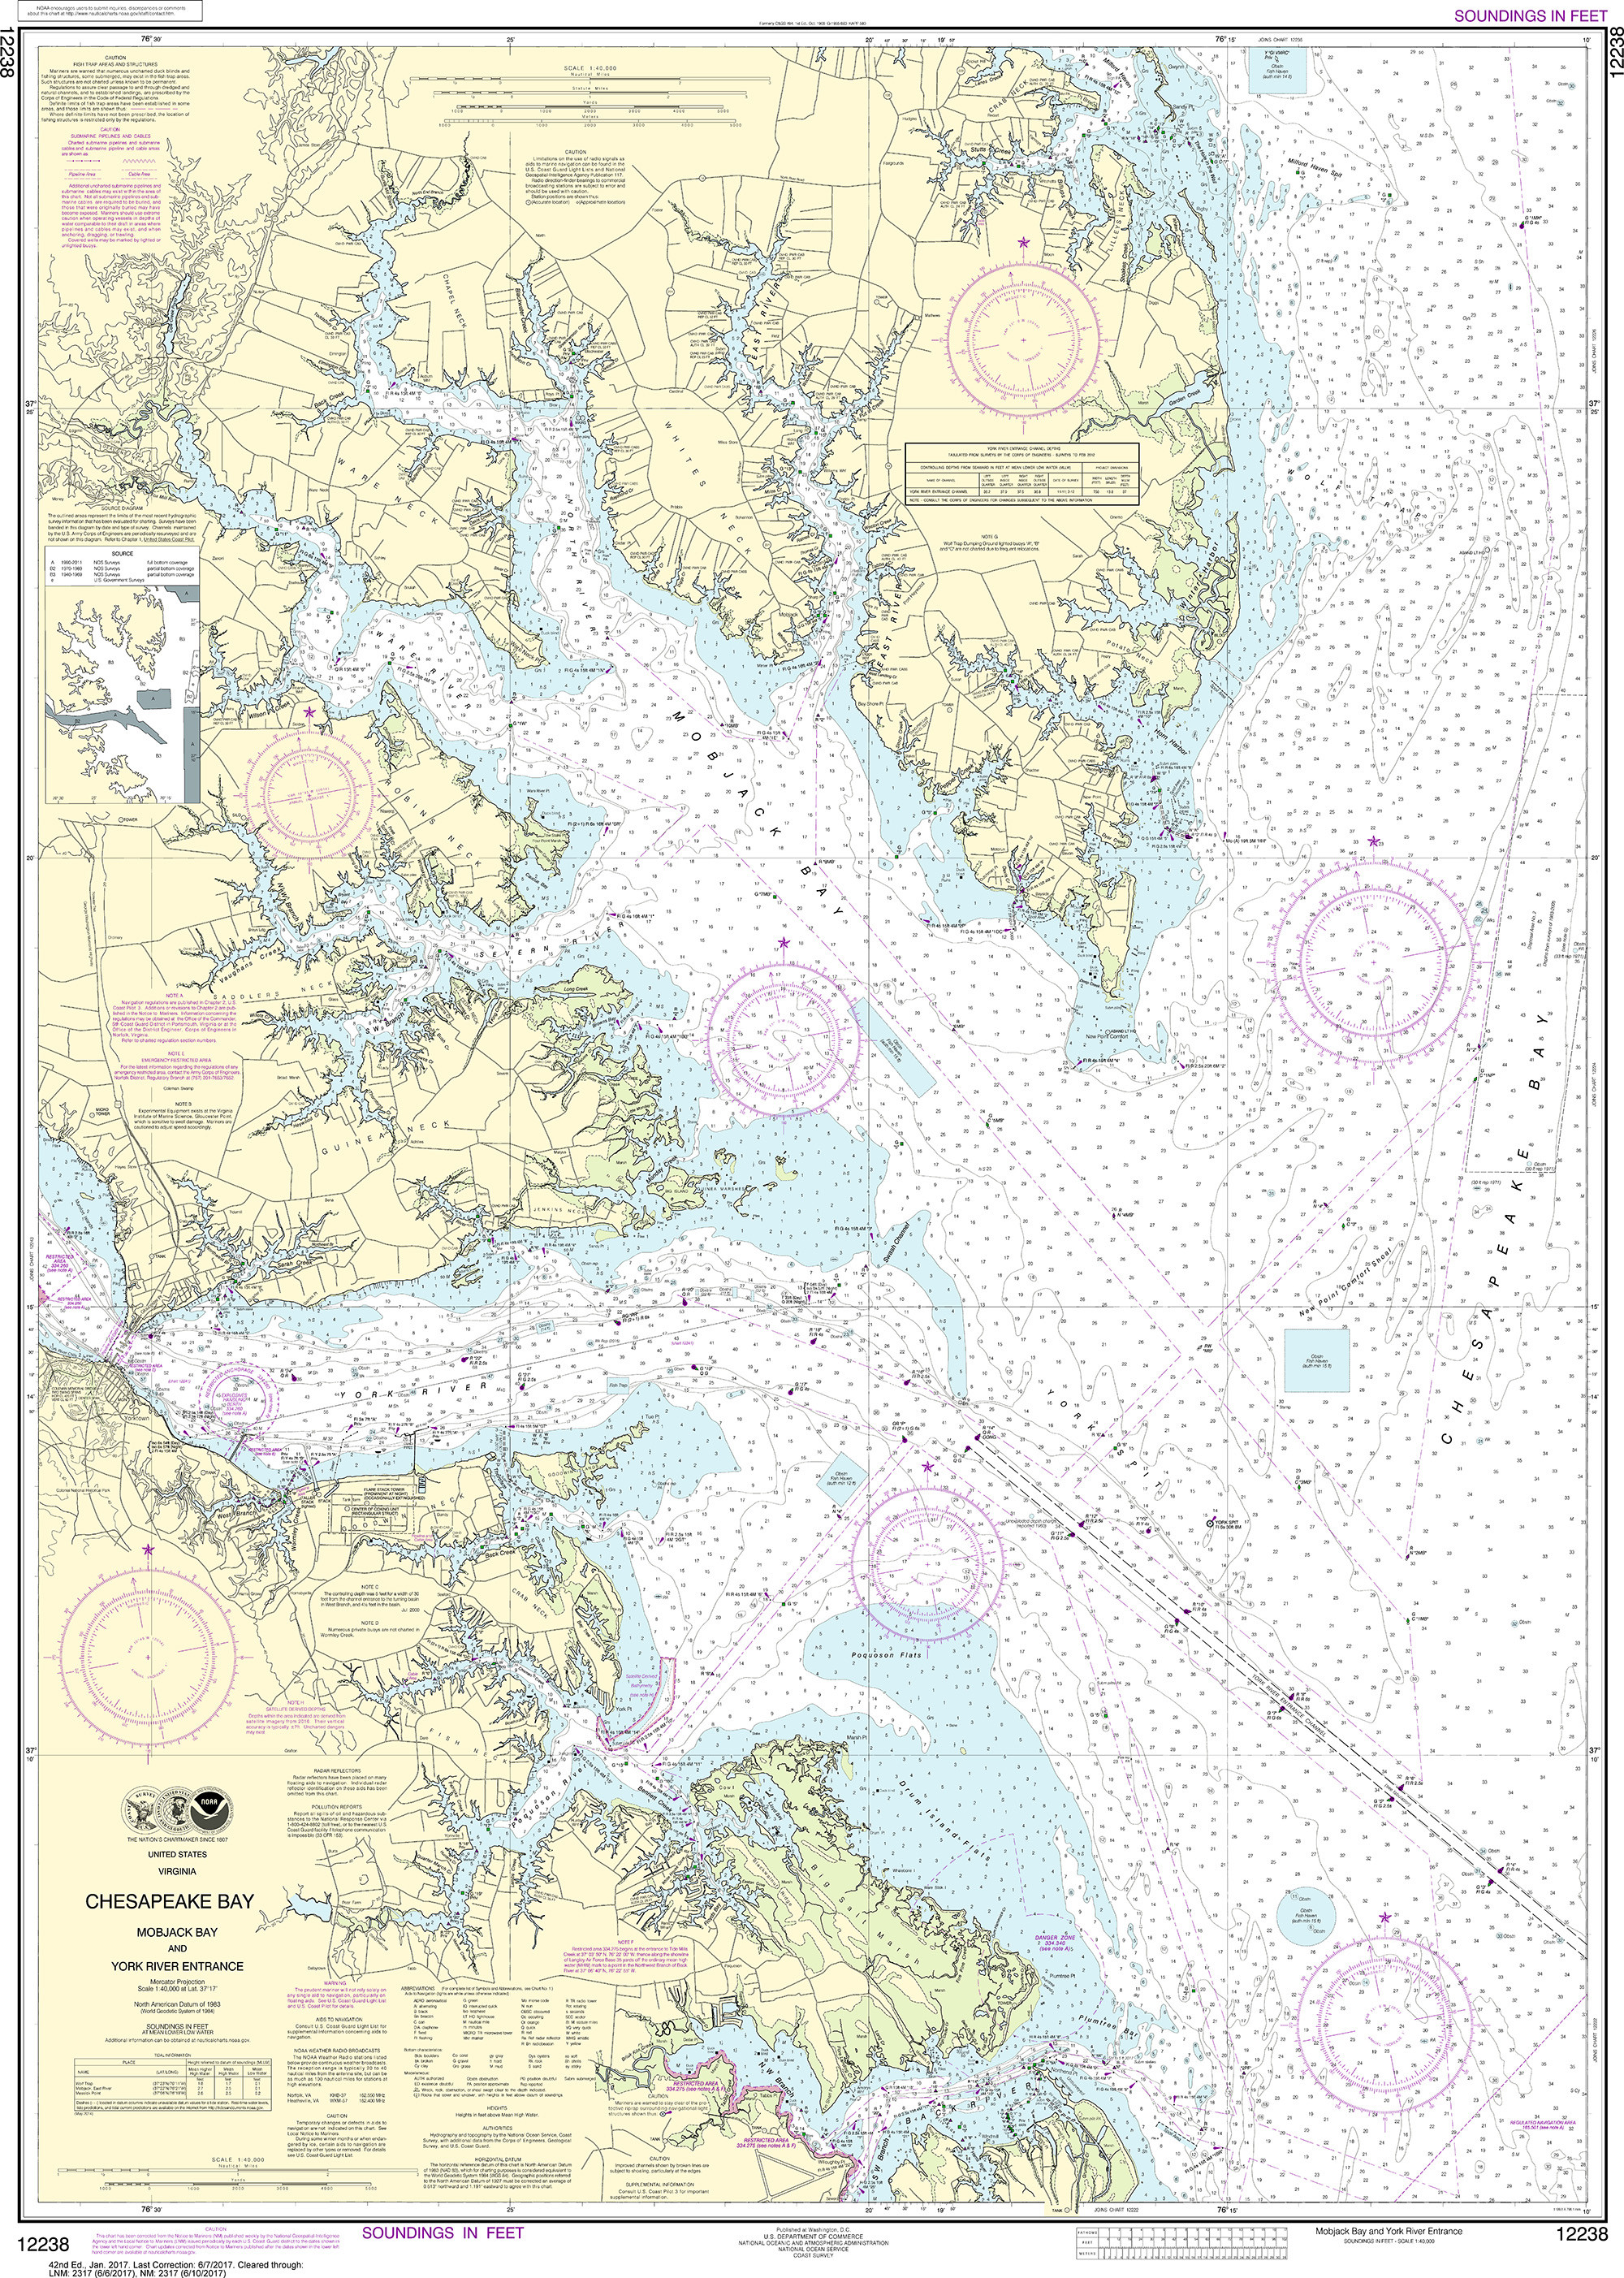 Noaa Nautical Chart 12238 Chesapeake Bay Mobjack And York River Entrance